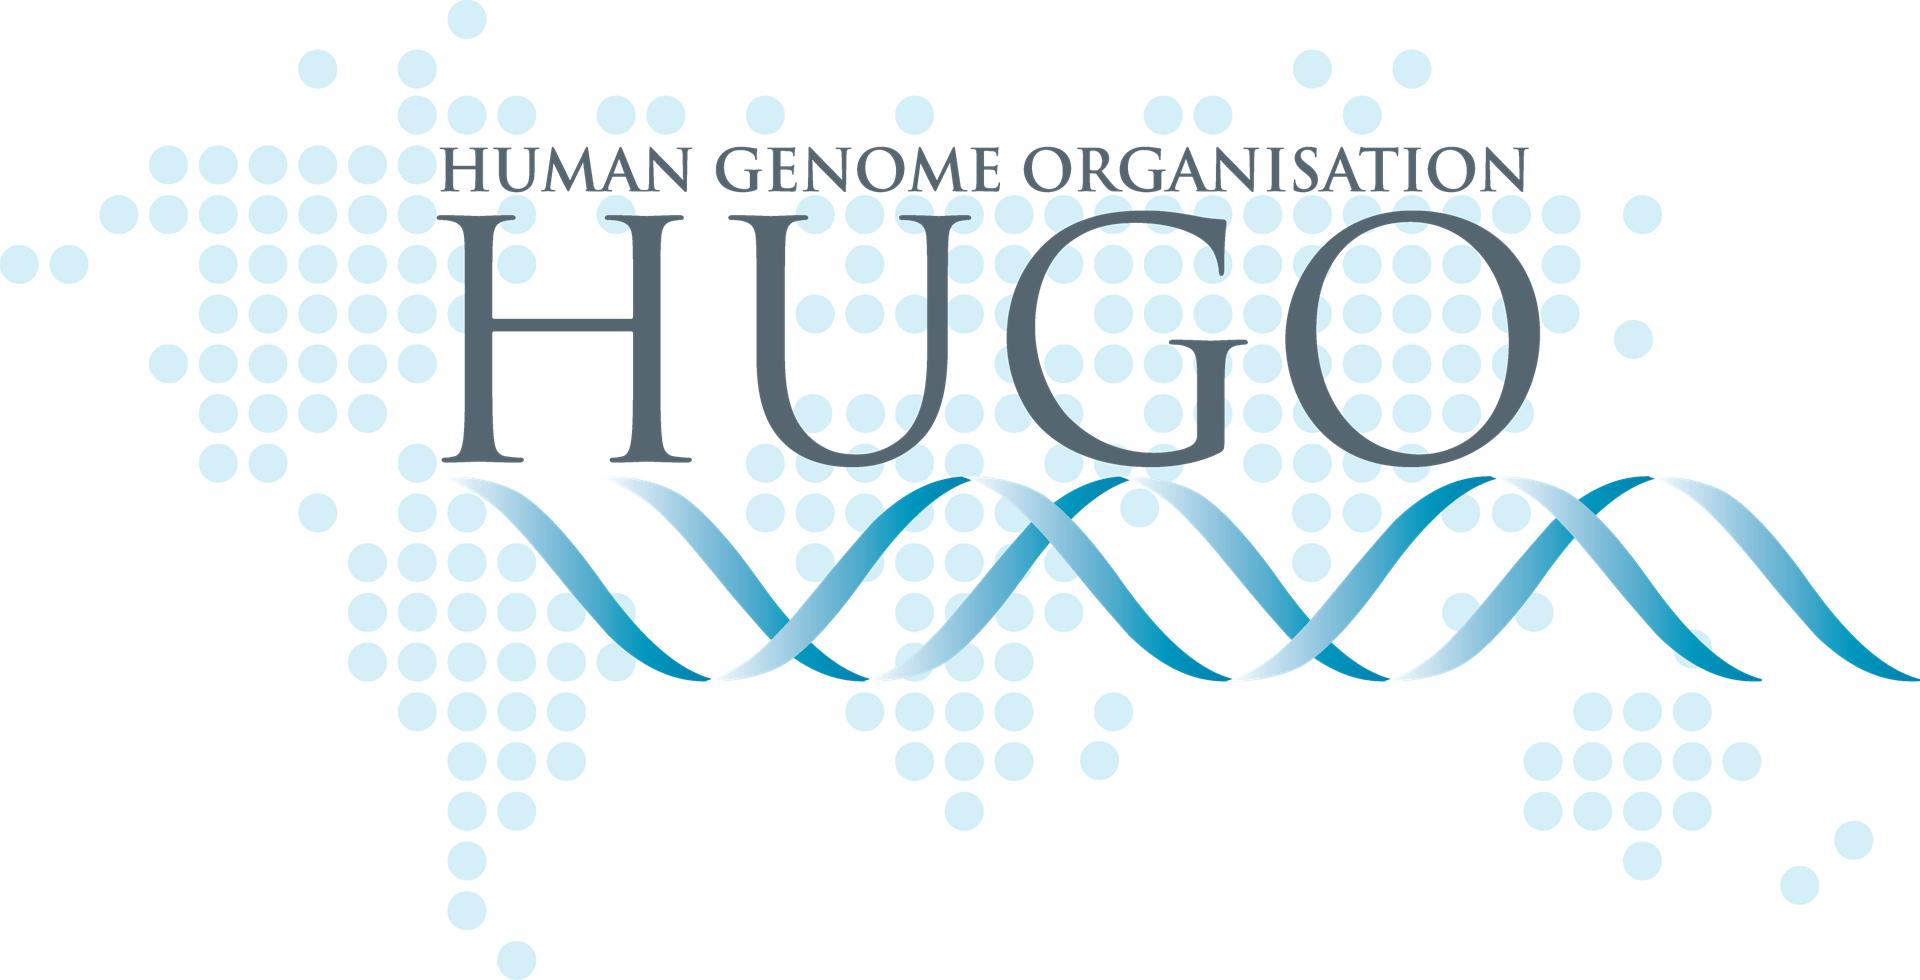 Human Genome Organisation